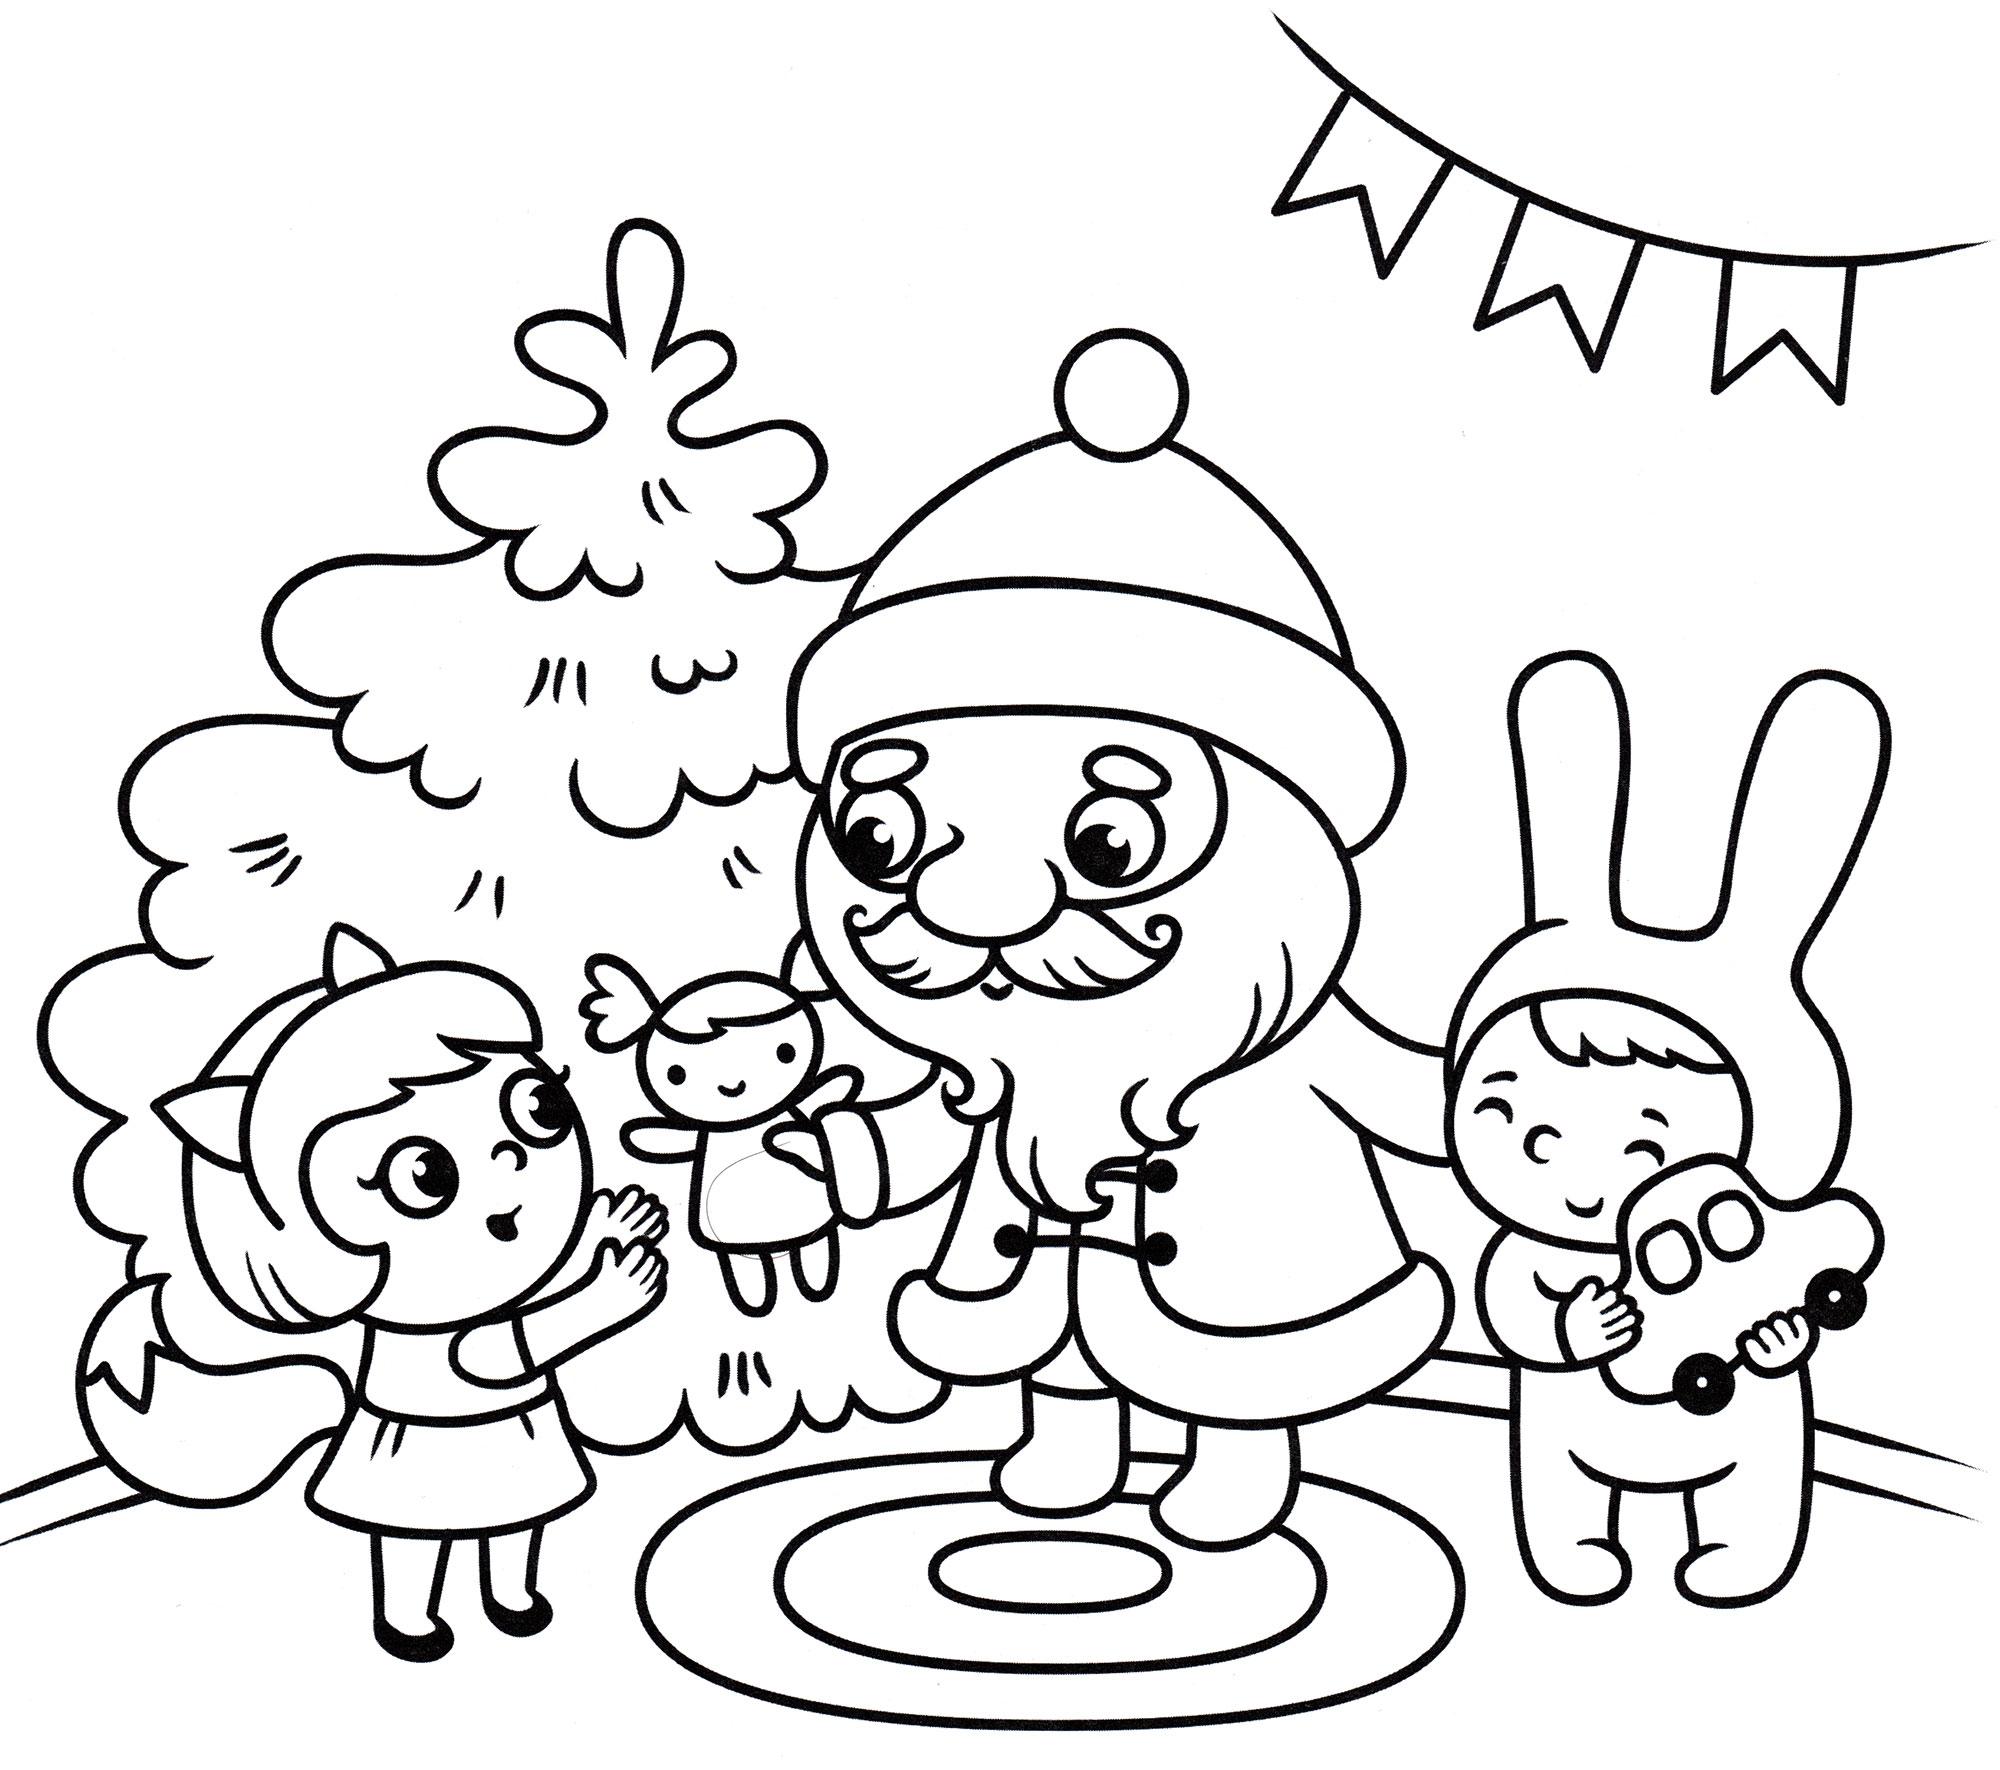 Раскраска Дед мороз дарит подарки